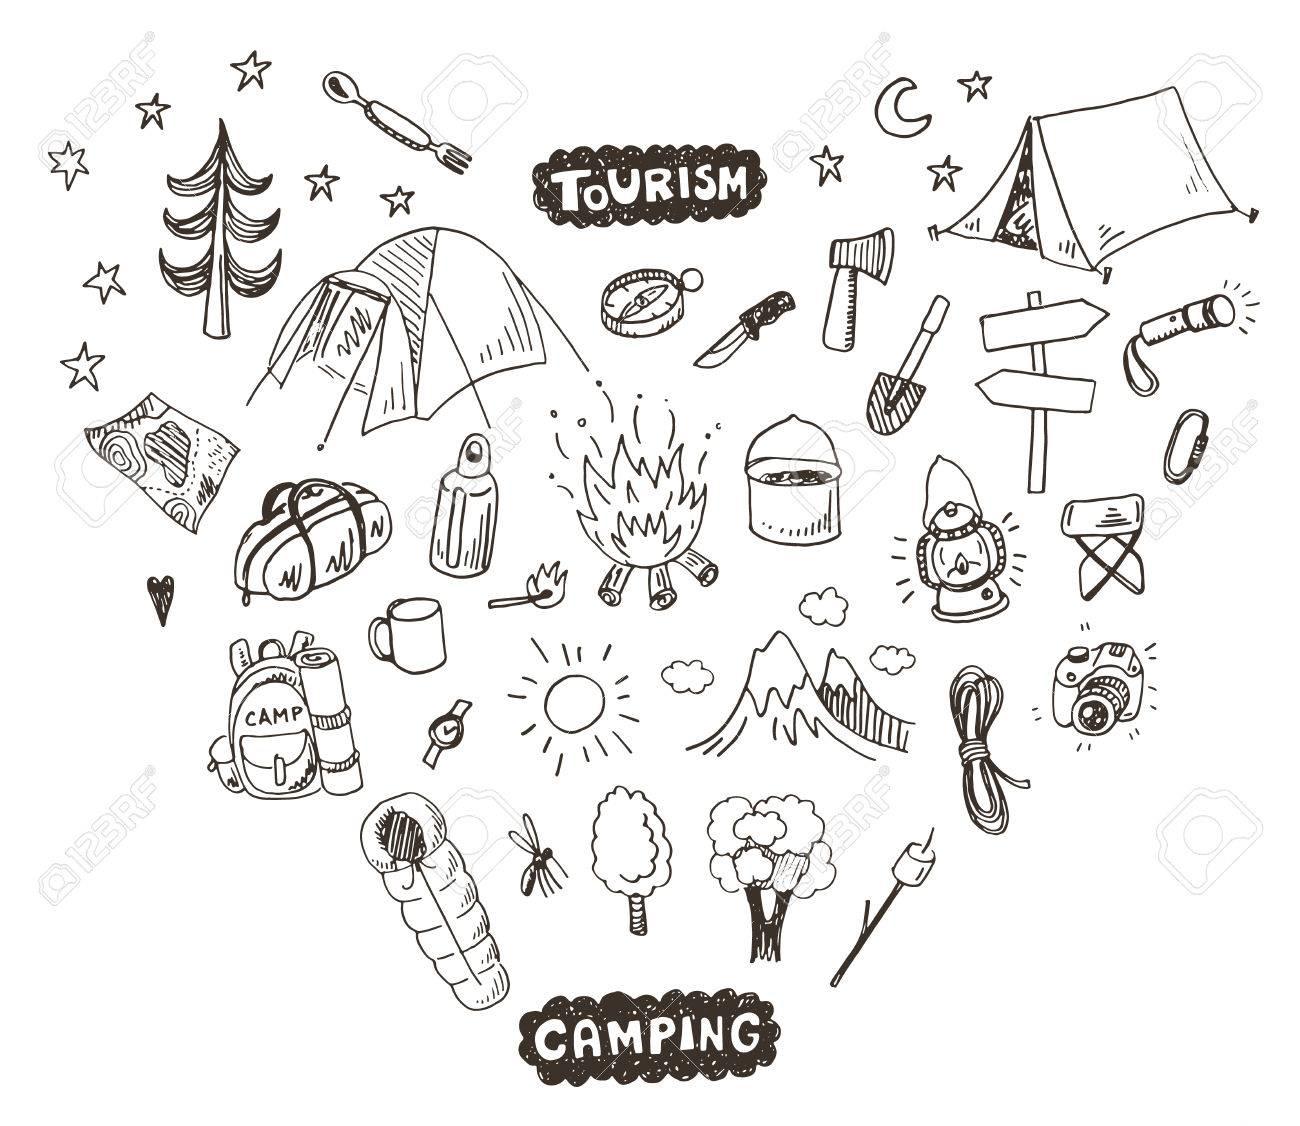 Hand drawn sketch camping icons set. - 50076284